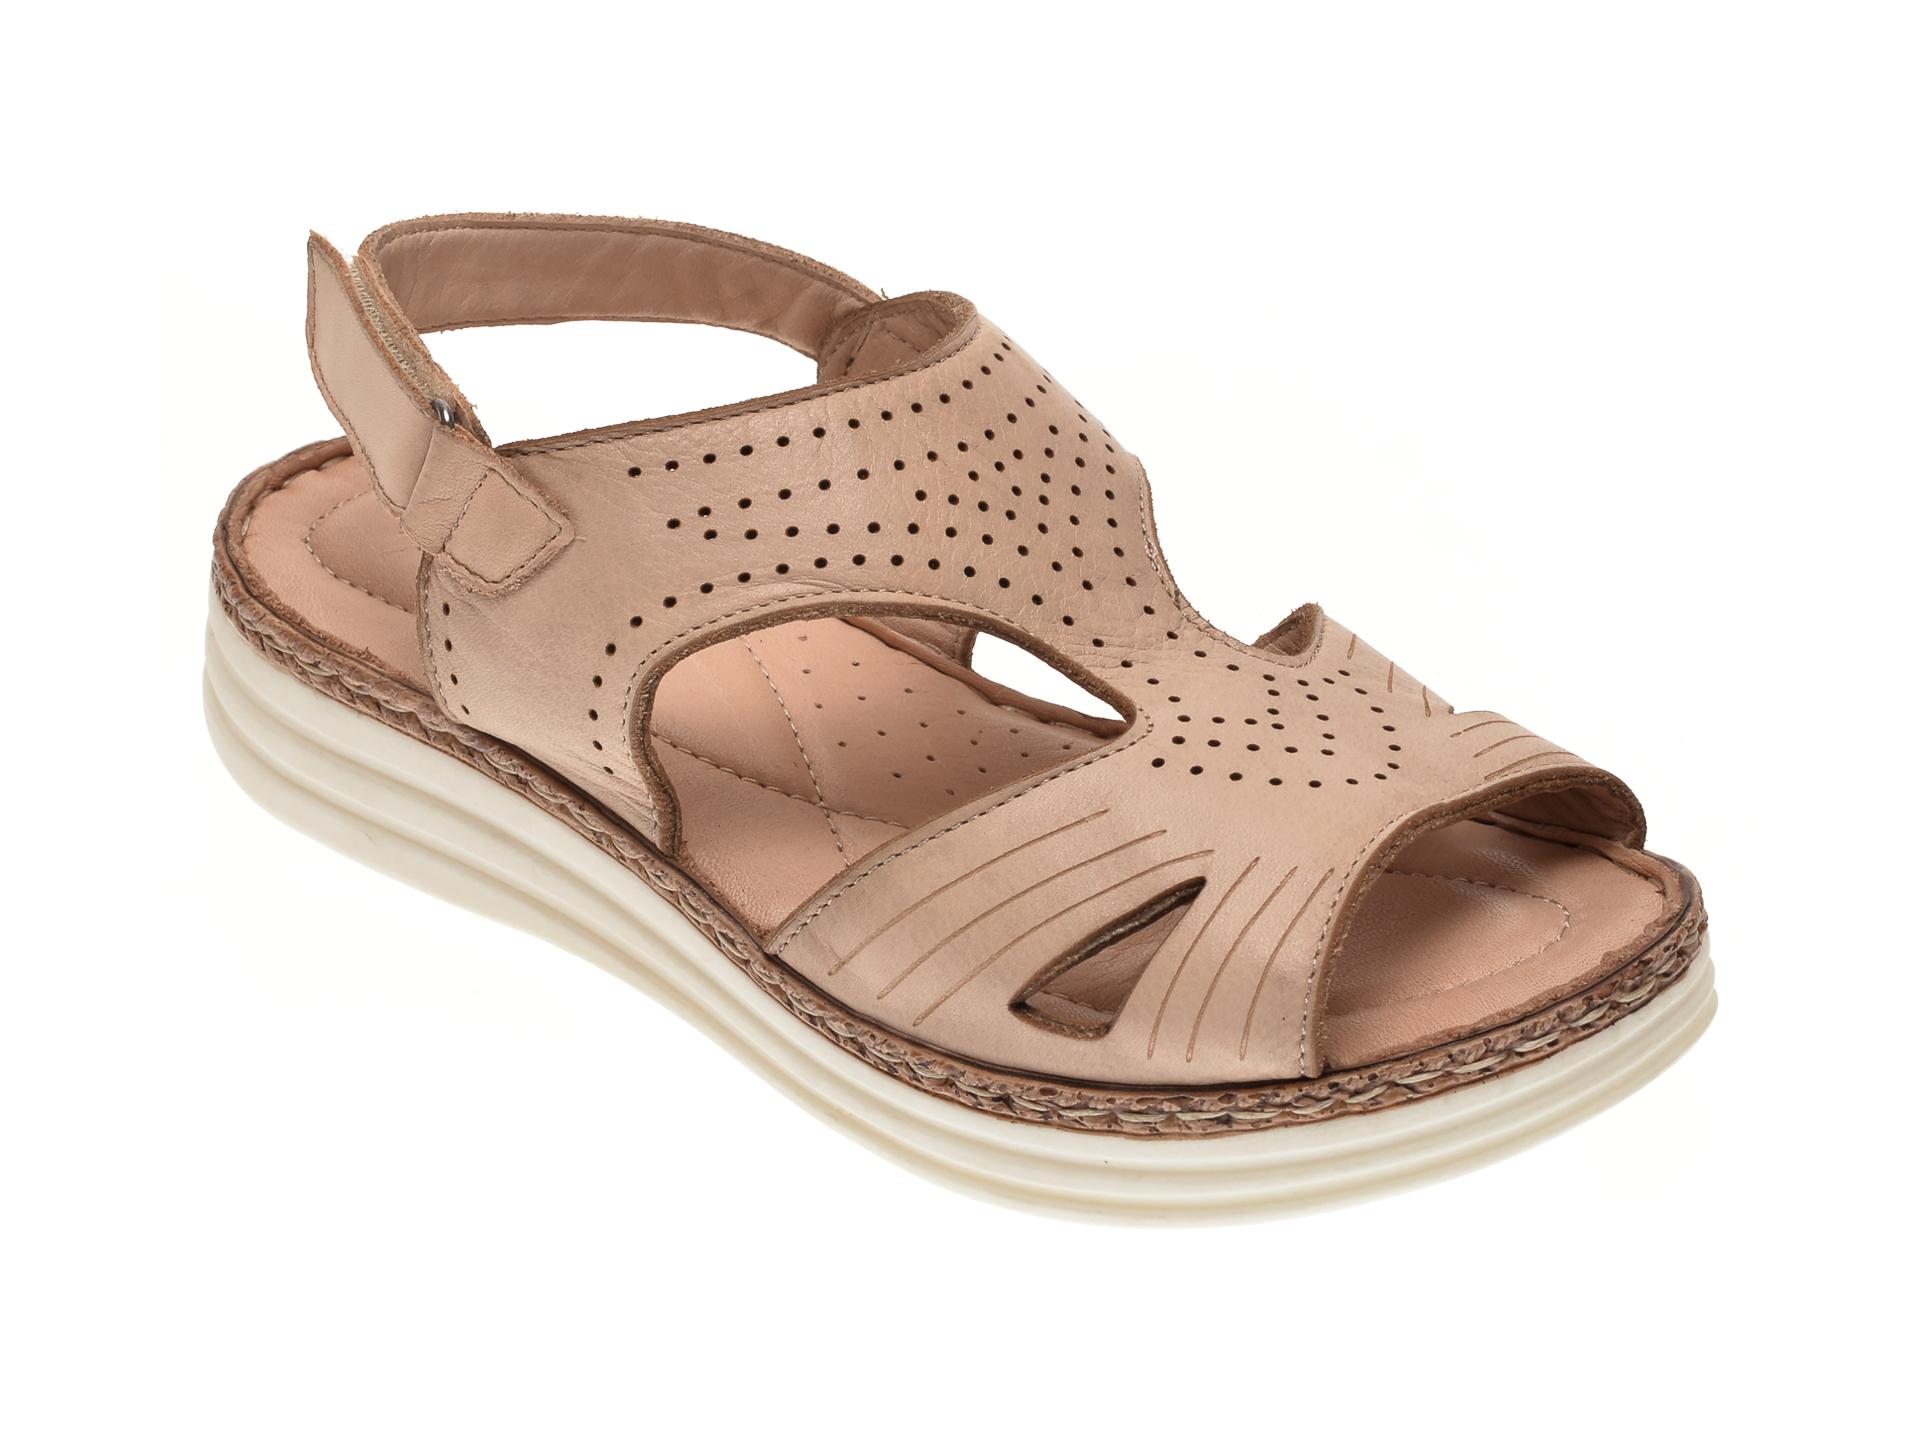 Sandale MARCHA bej, 535, din piele naturala